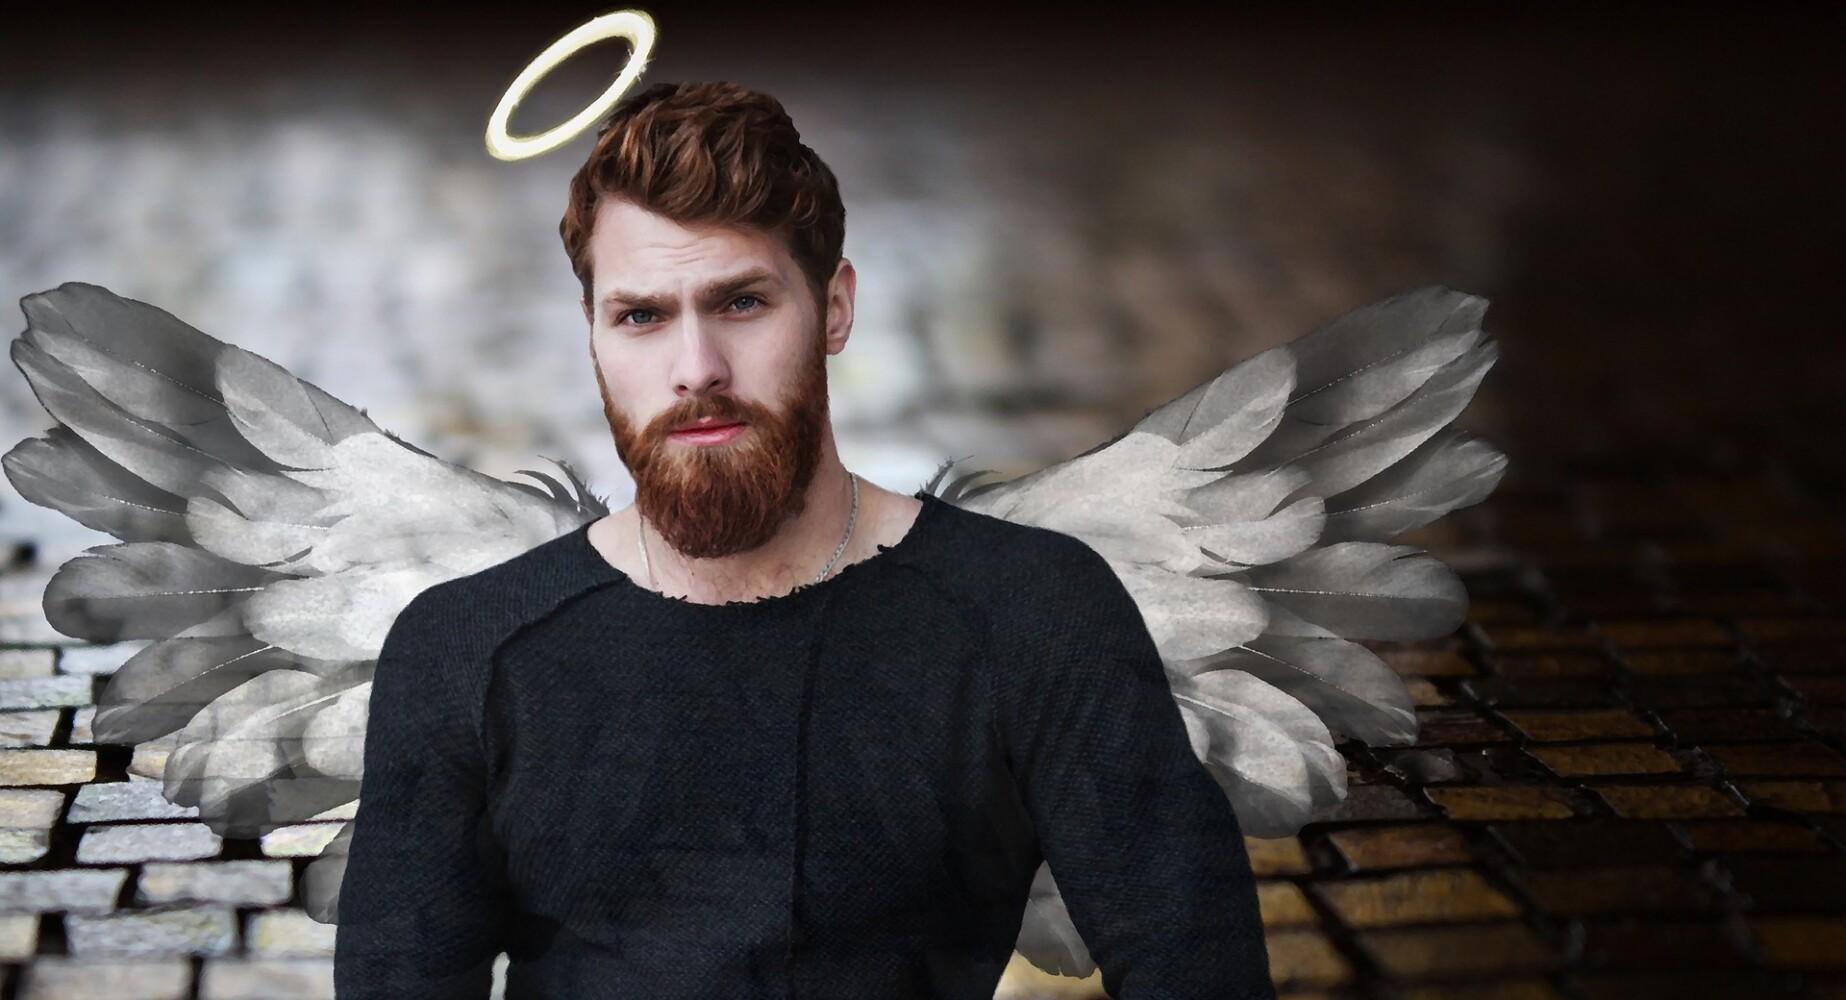 De reddende engel!